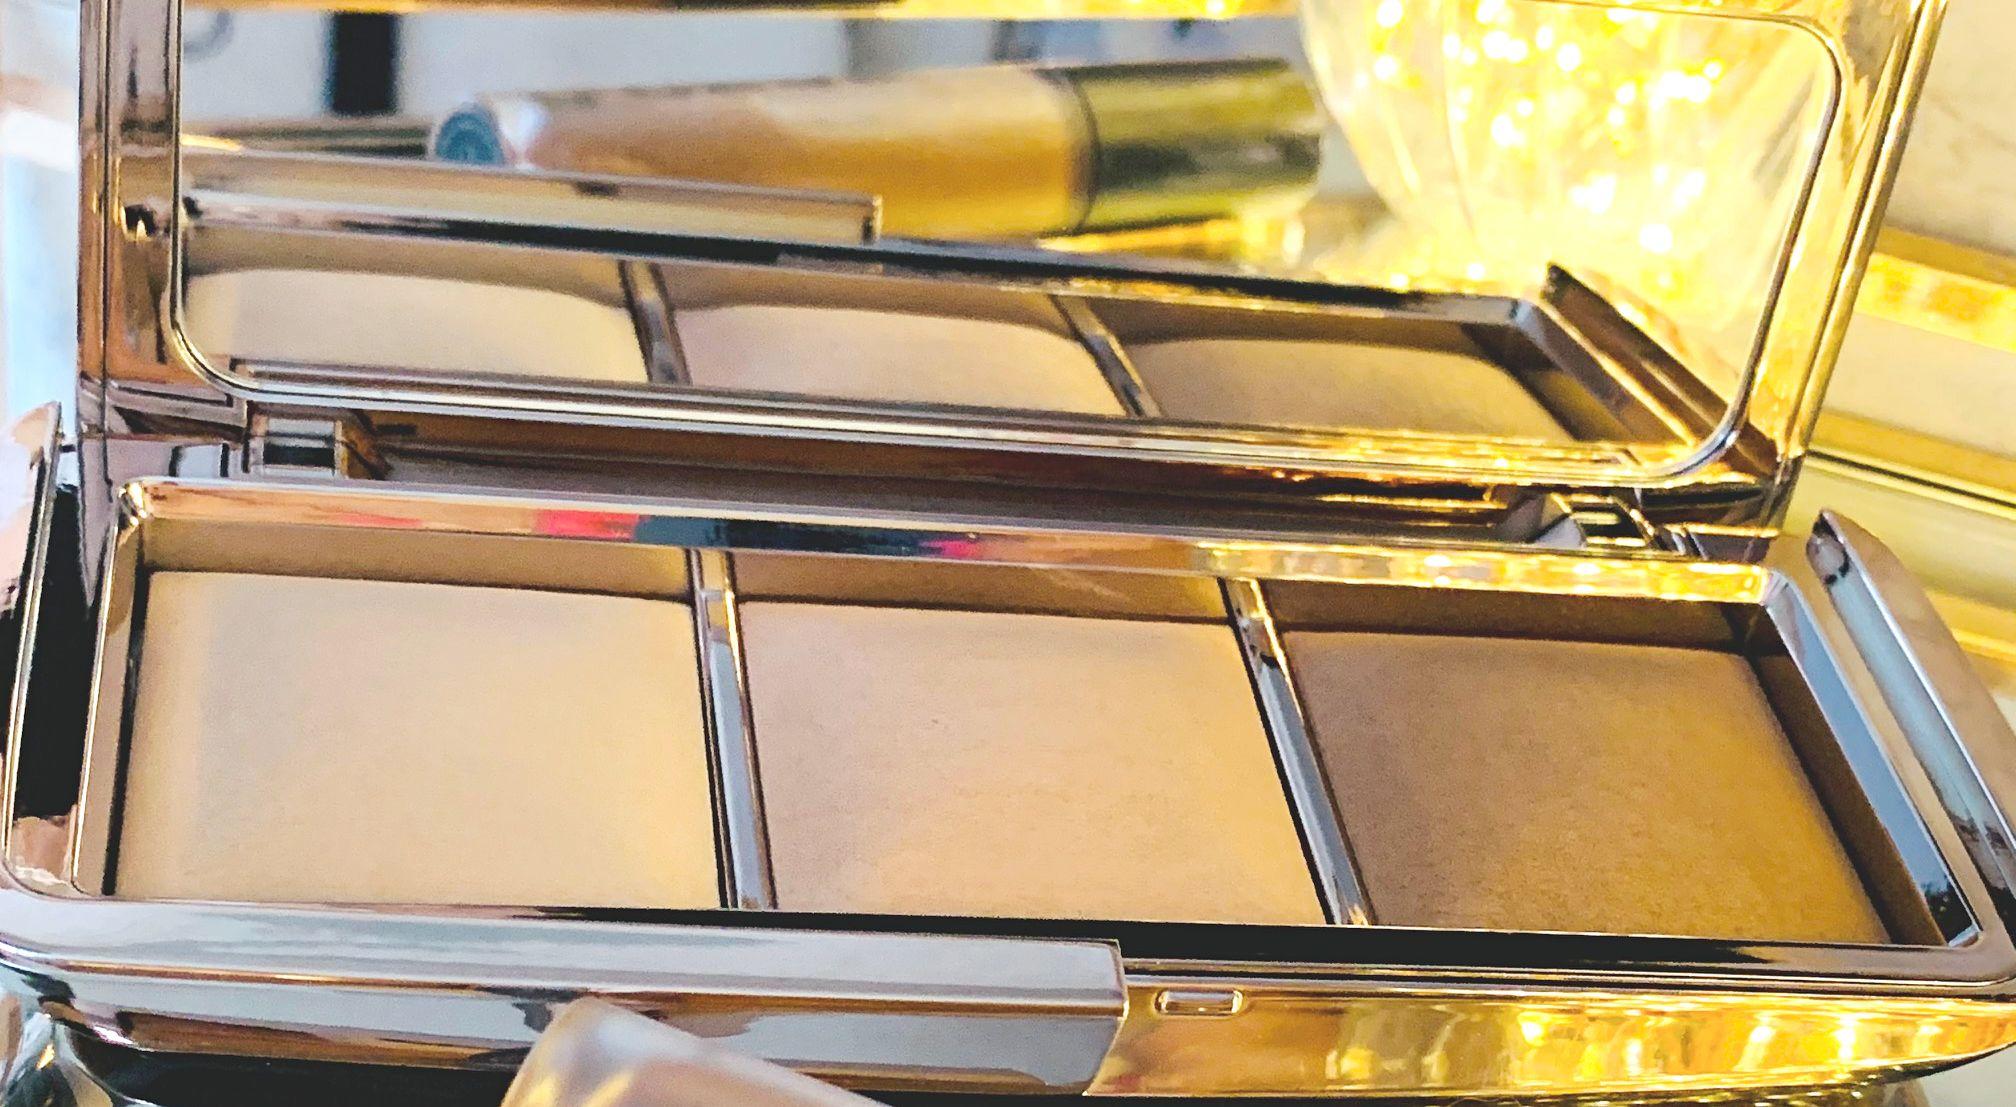 21 Questions: Makeup Edition